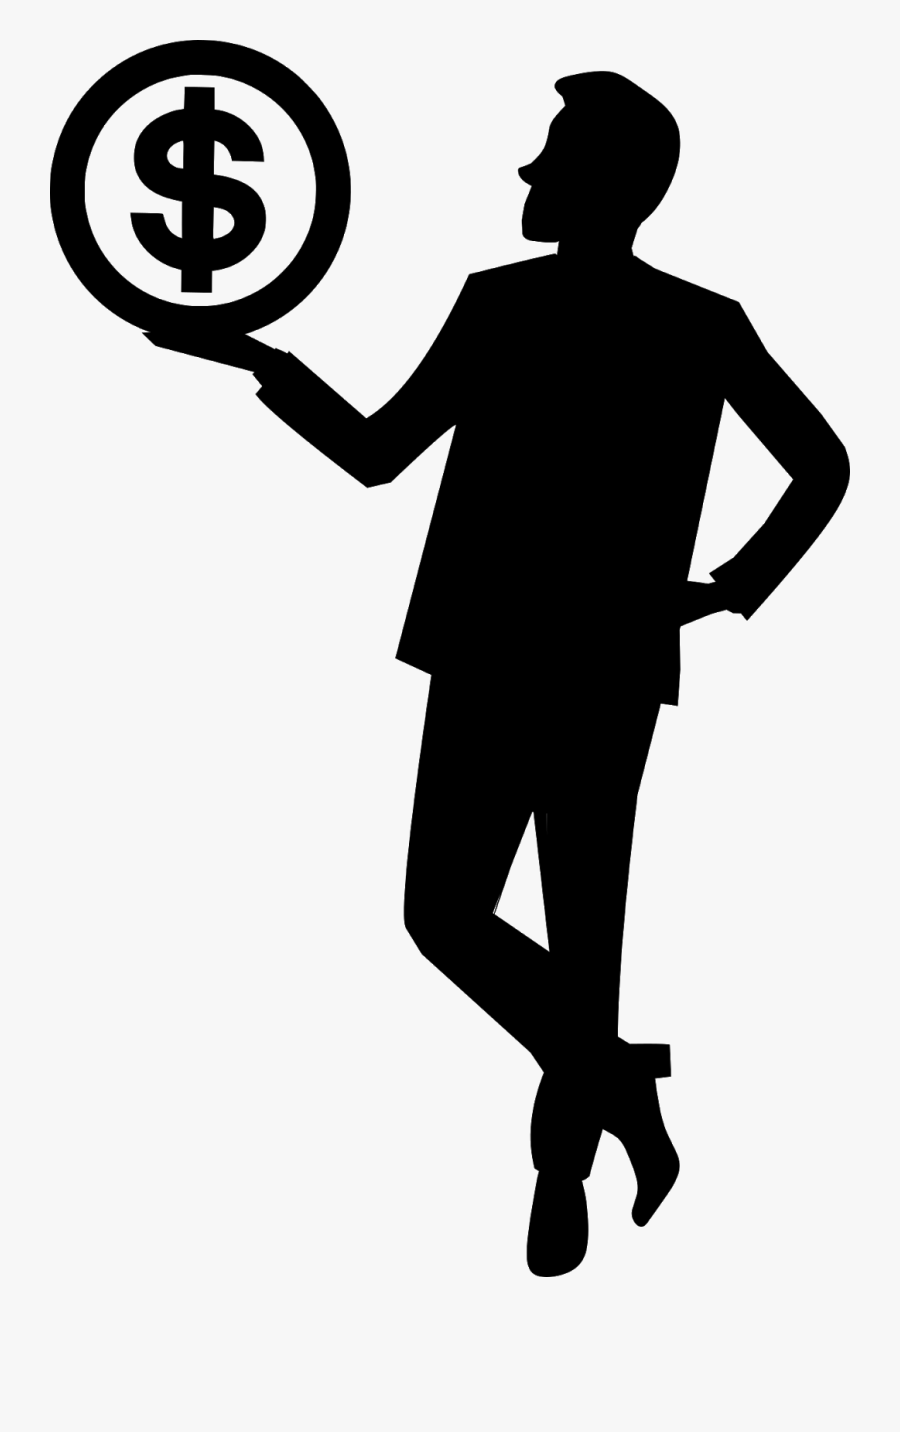 Businessman, Achievement, Bank, Silhouette, Banknotes, - Businessman Silhouette Money, Transparent Clipart